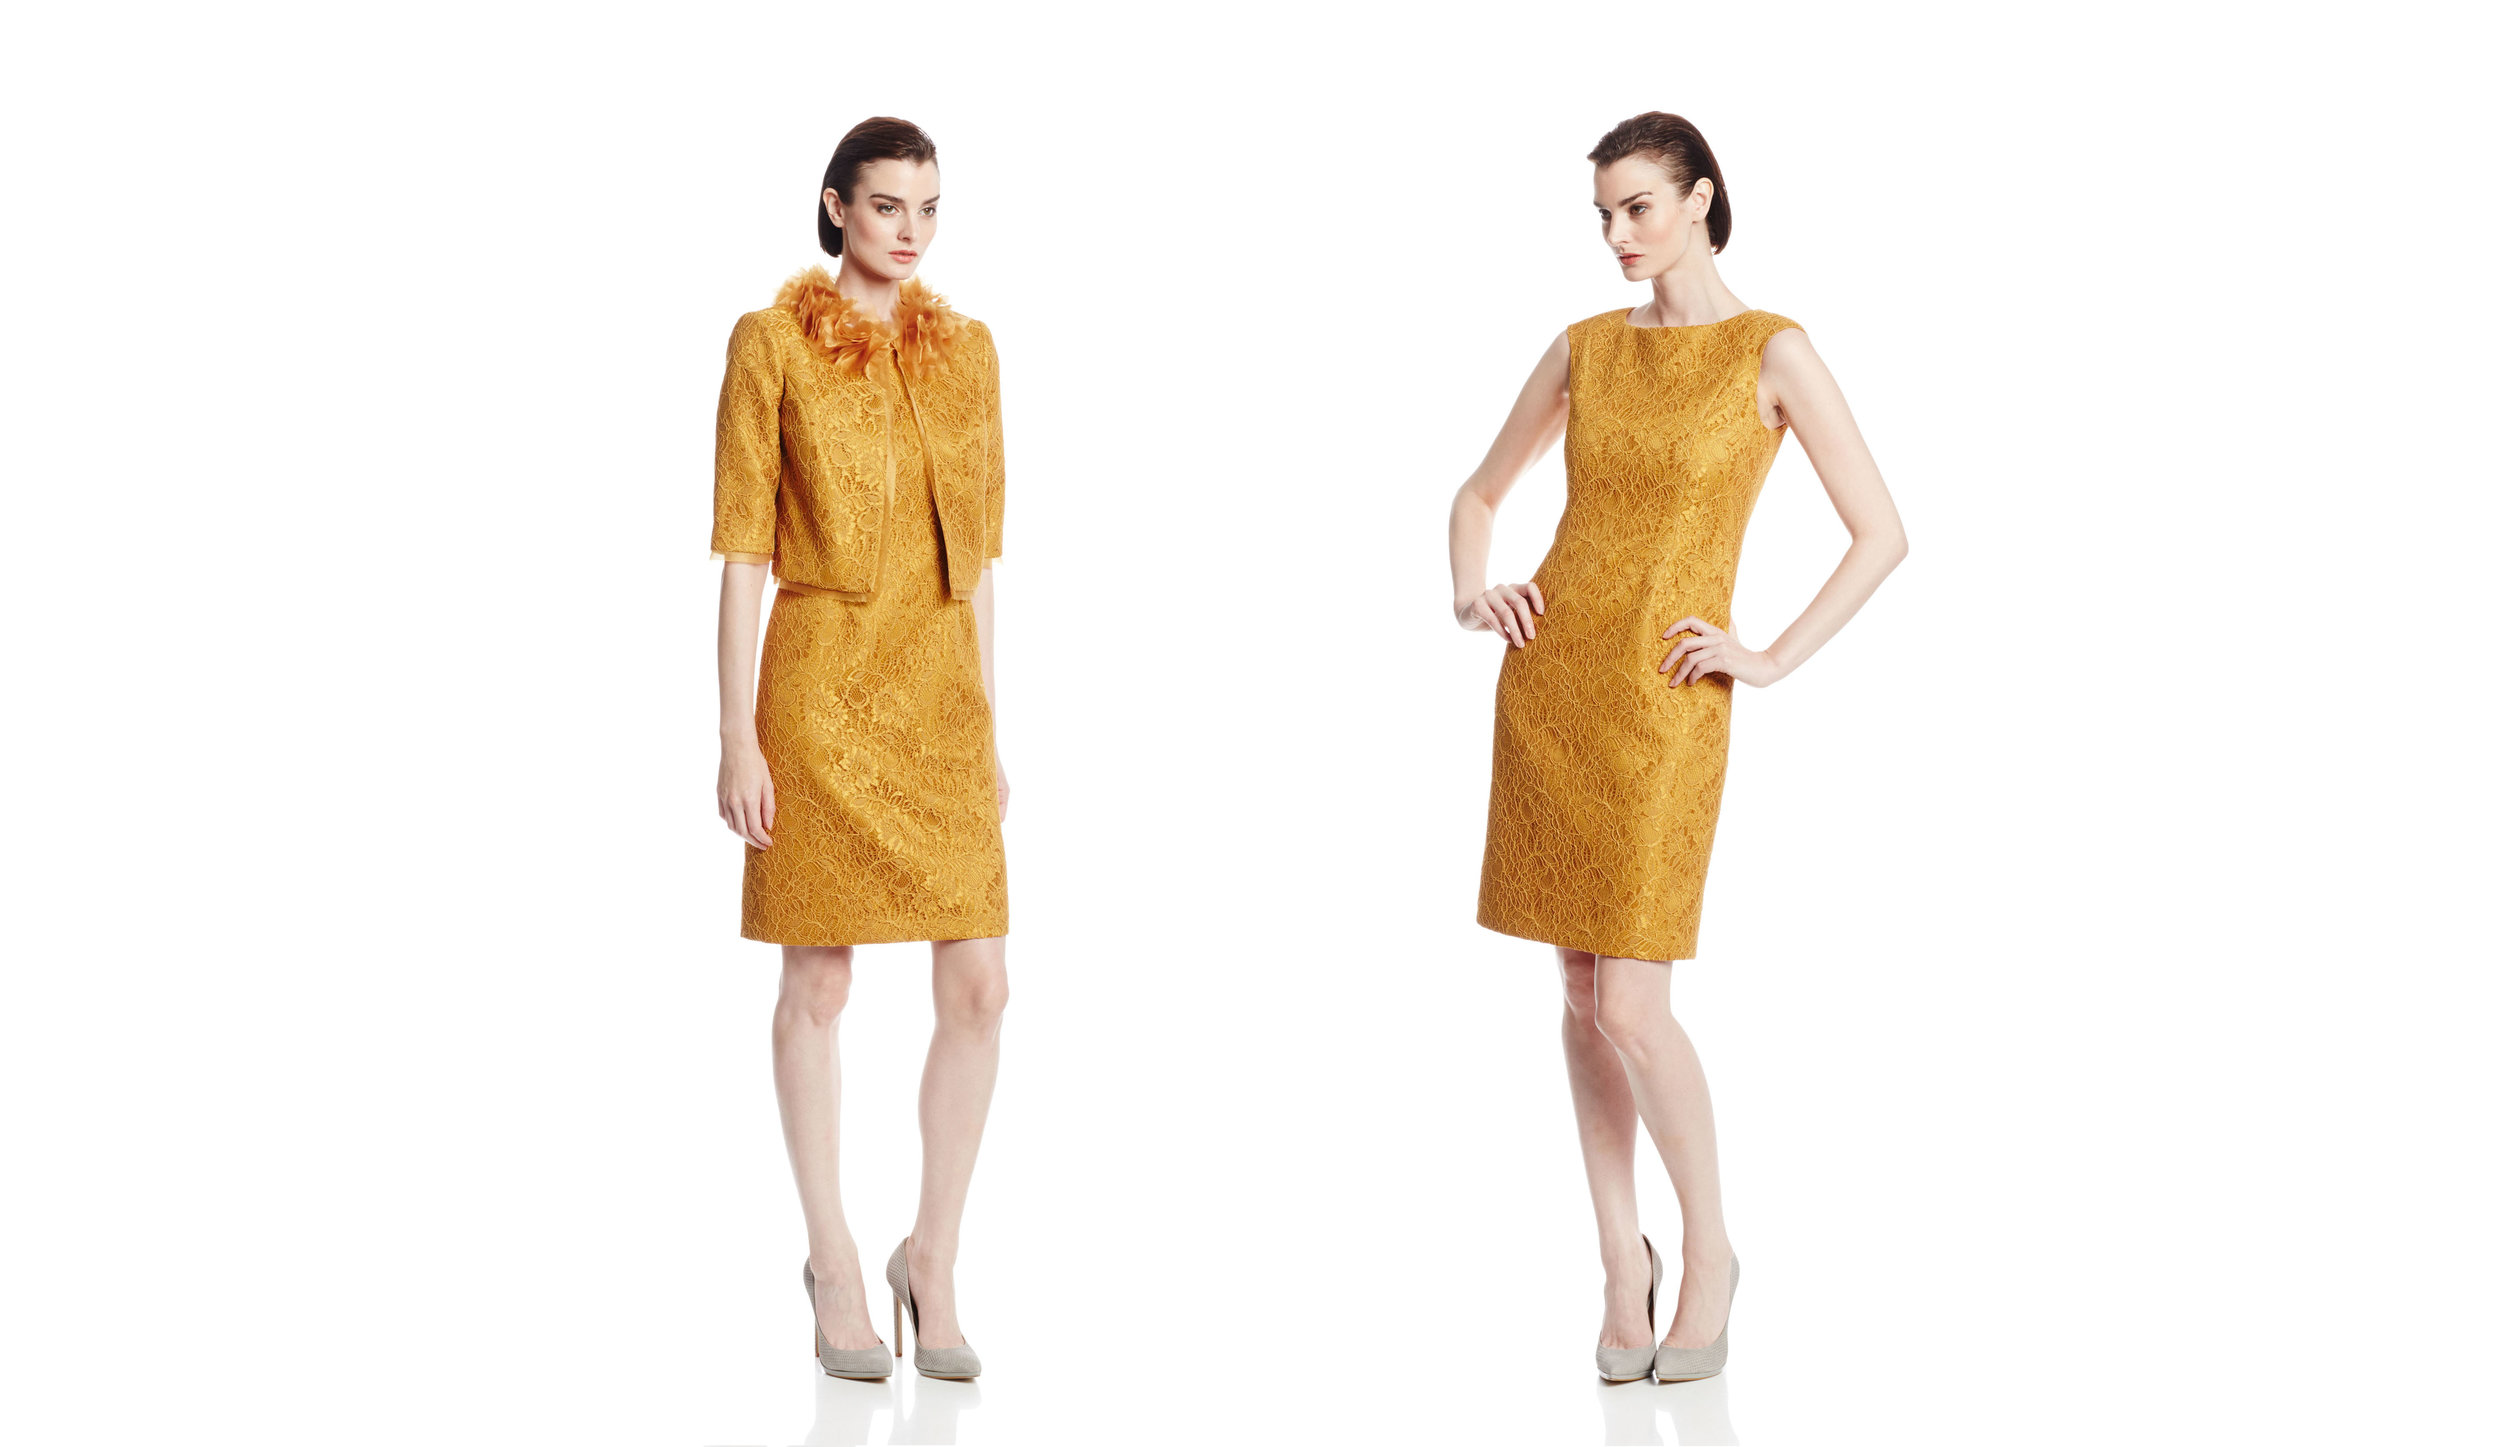 Mustard Gold Lace Dress Suit Full Bleed copy.jpg